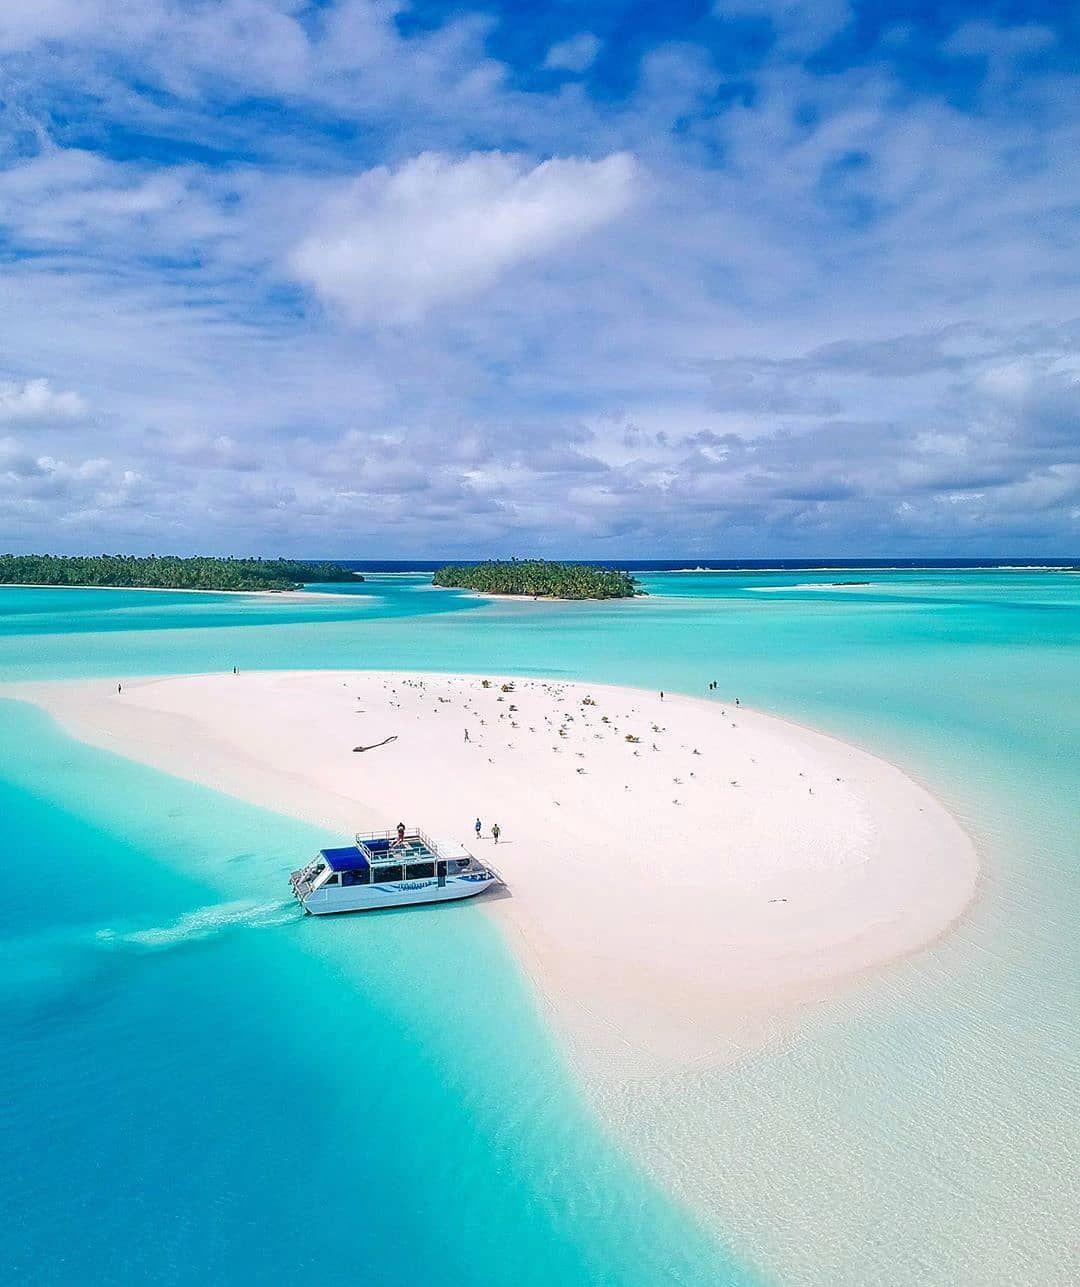 Cook Islands Best Beaches: Aitutaki, Cook Islands ☀️🏝️ 📸 @_markfitz (With Images